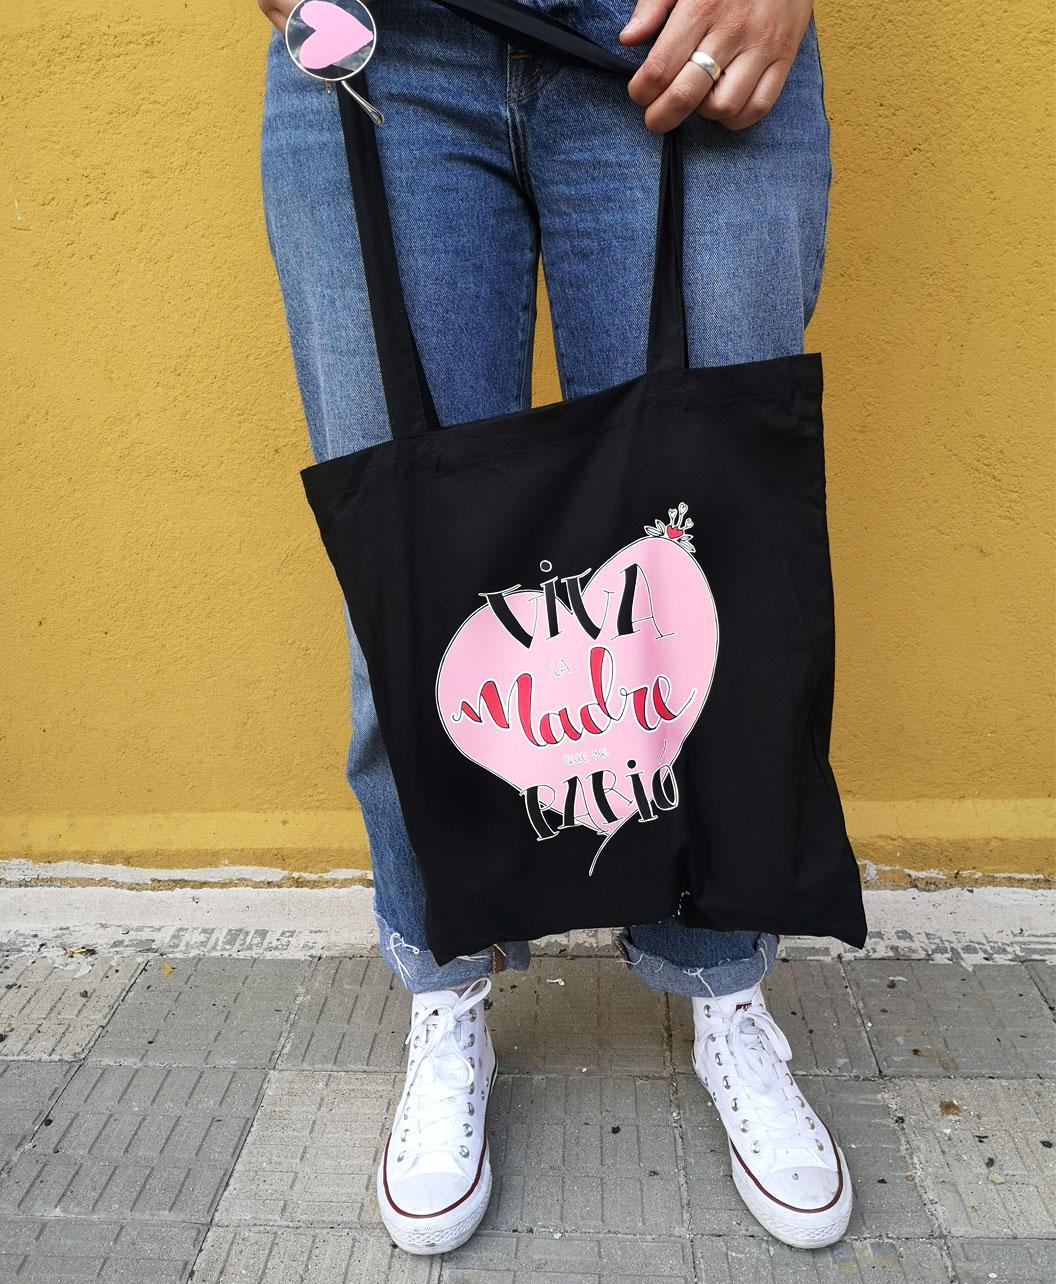 tote bag negro ilustracion frase regalo especial dia de la madre